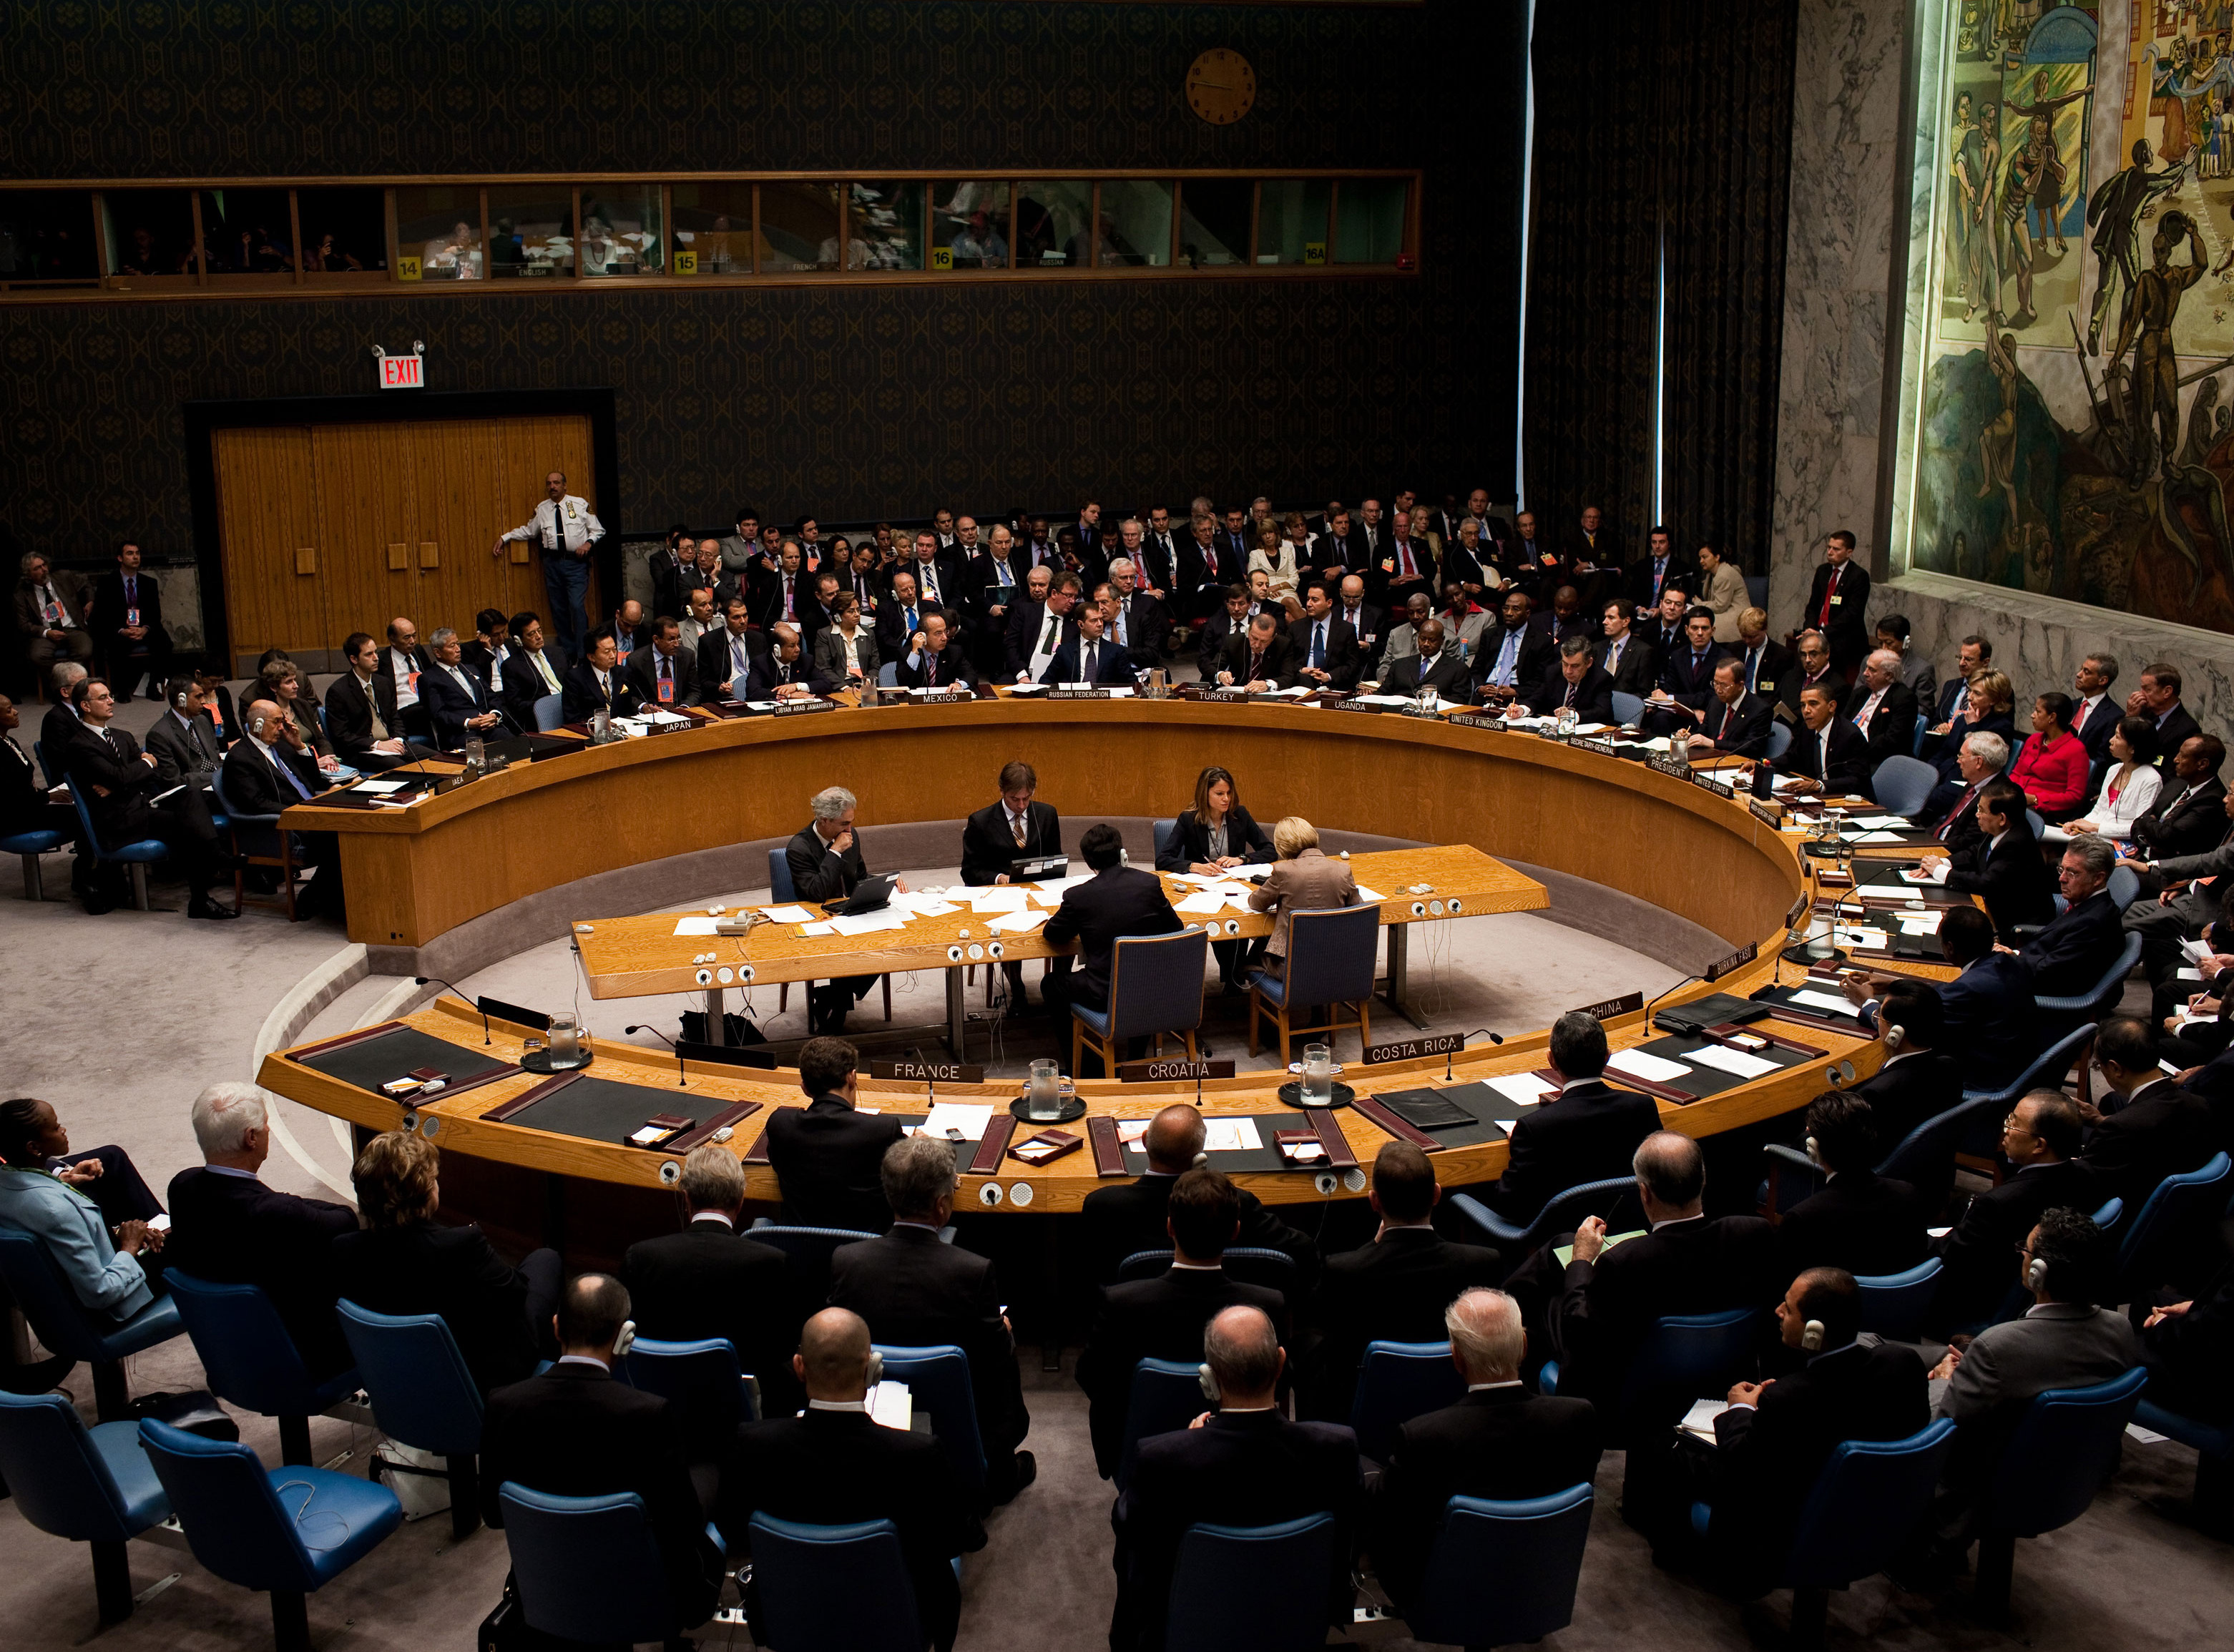 Jungtinių Tautų (JT) Generalinė Asamblėja | en.wikipedija.org nuotr.